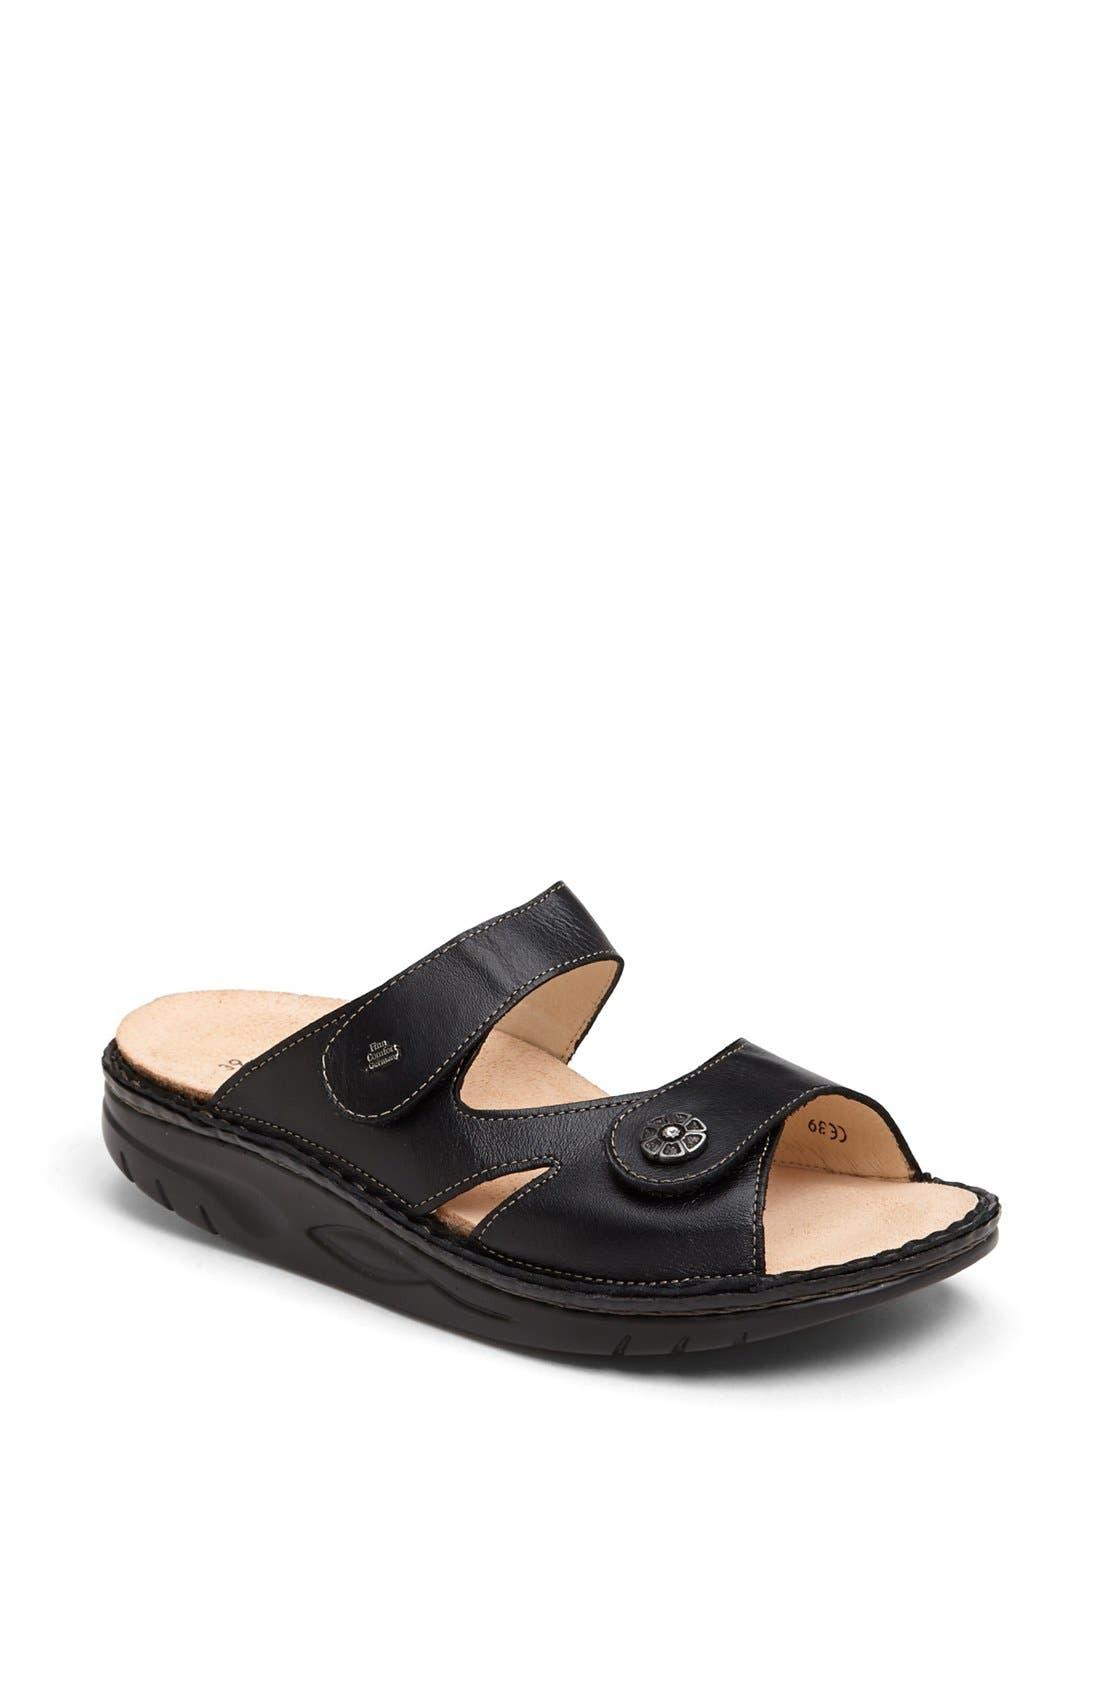 FINNAMIC by Finn Comfort 'Sanaa' Walking Sandal,                         Main,                         color, Black